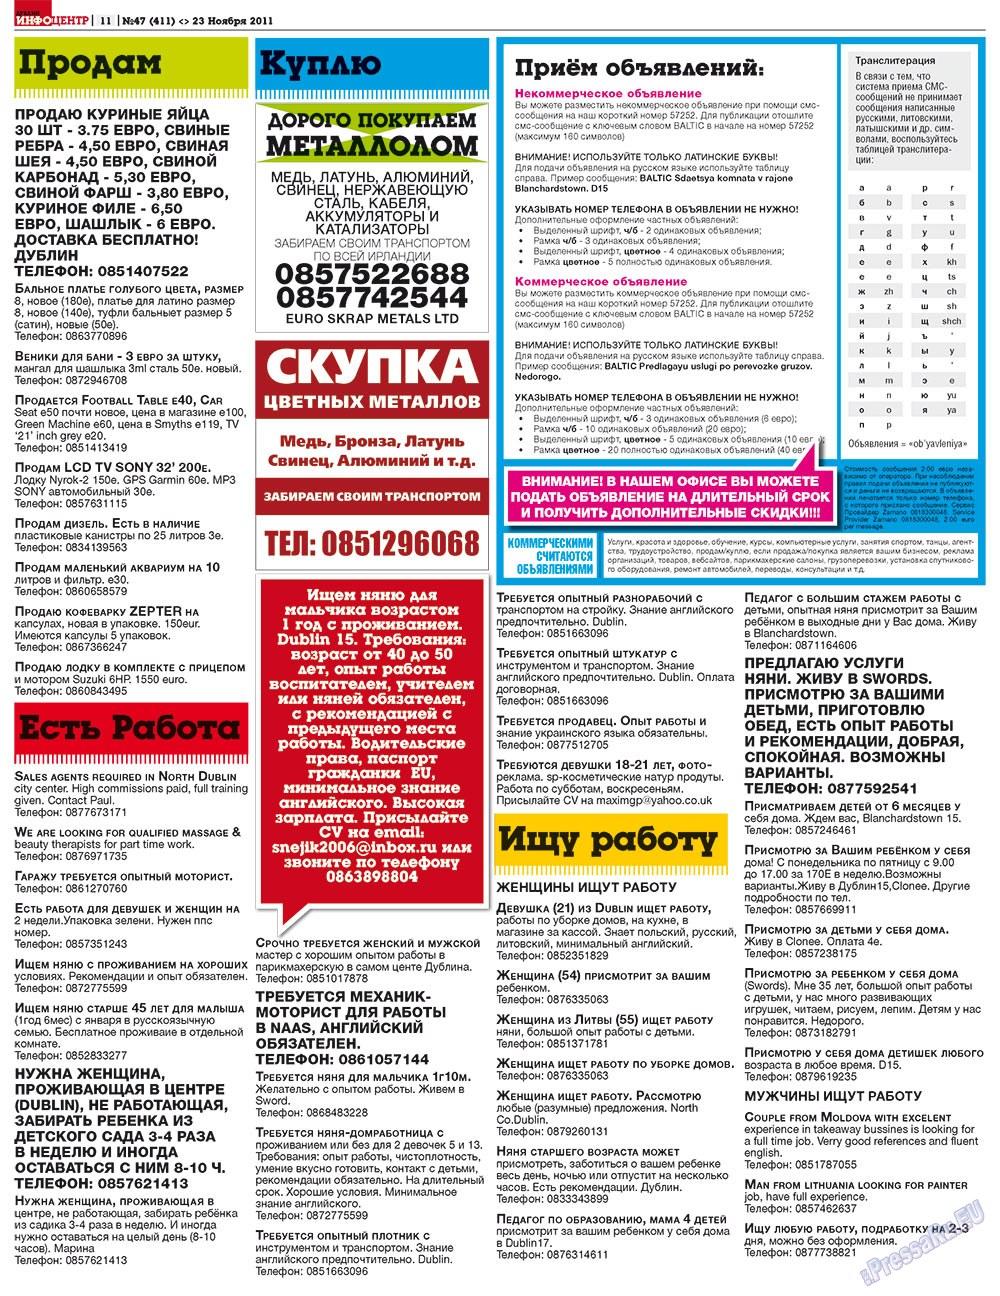 Дублин инфоцентр (газета). 2011 год, номер 47, стр. 11